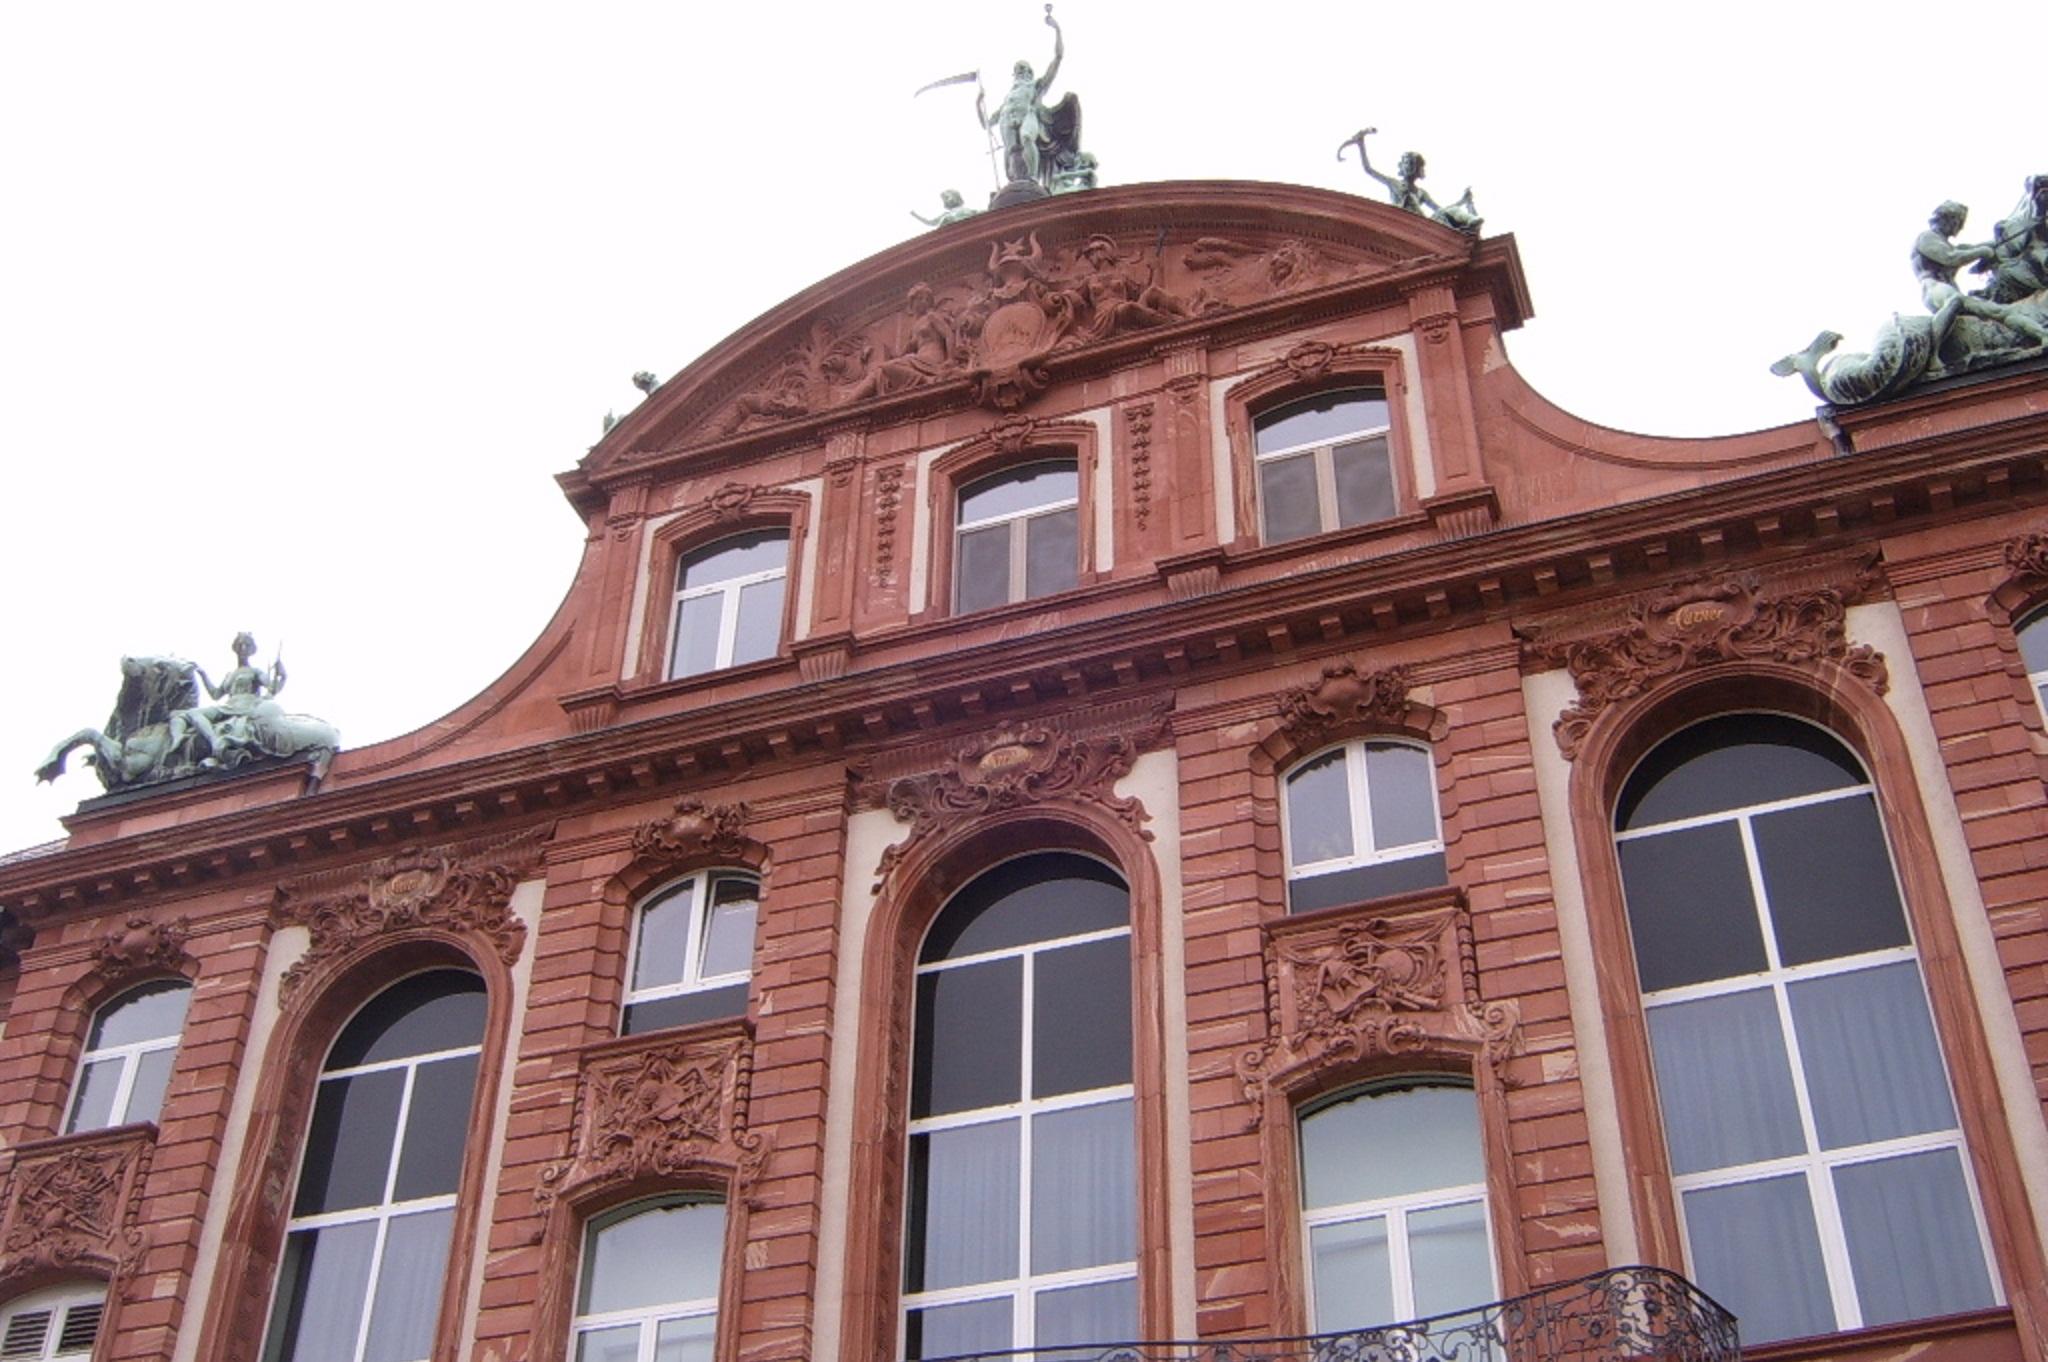 Senckenberg museum frankfurt germany facade architecture for Frankfurt architekturmuseum